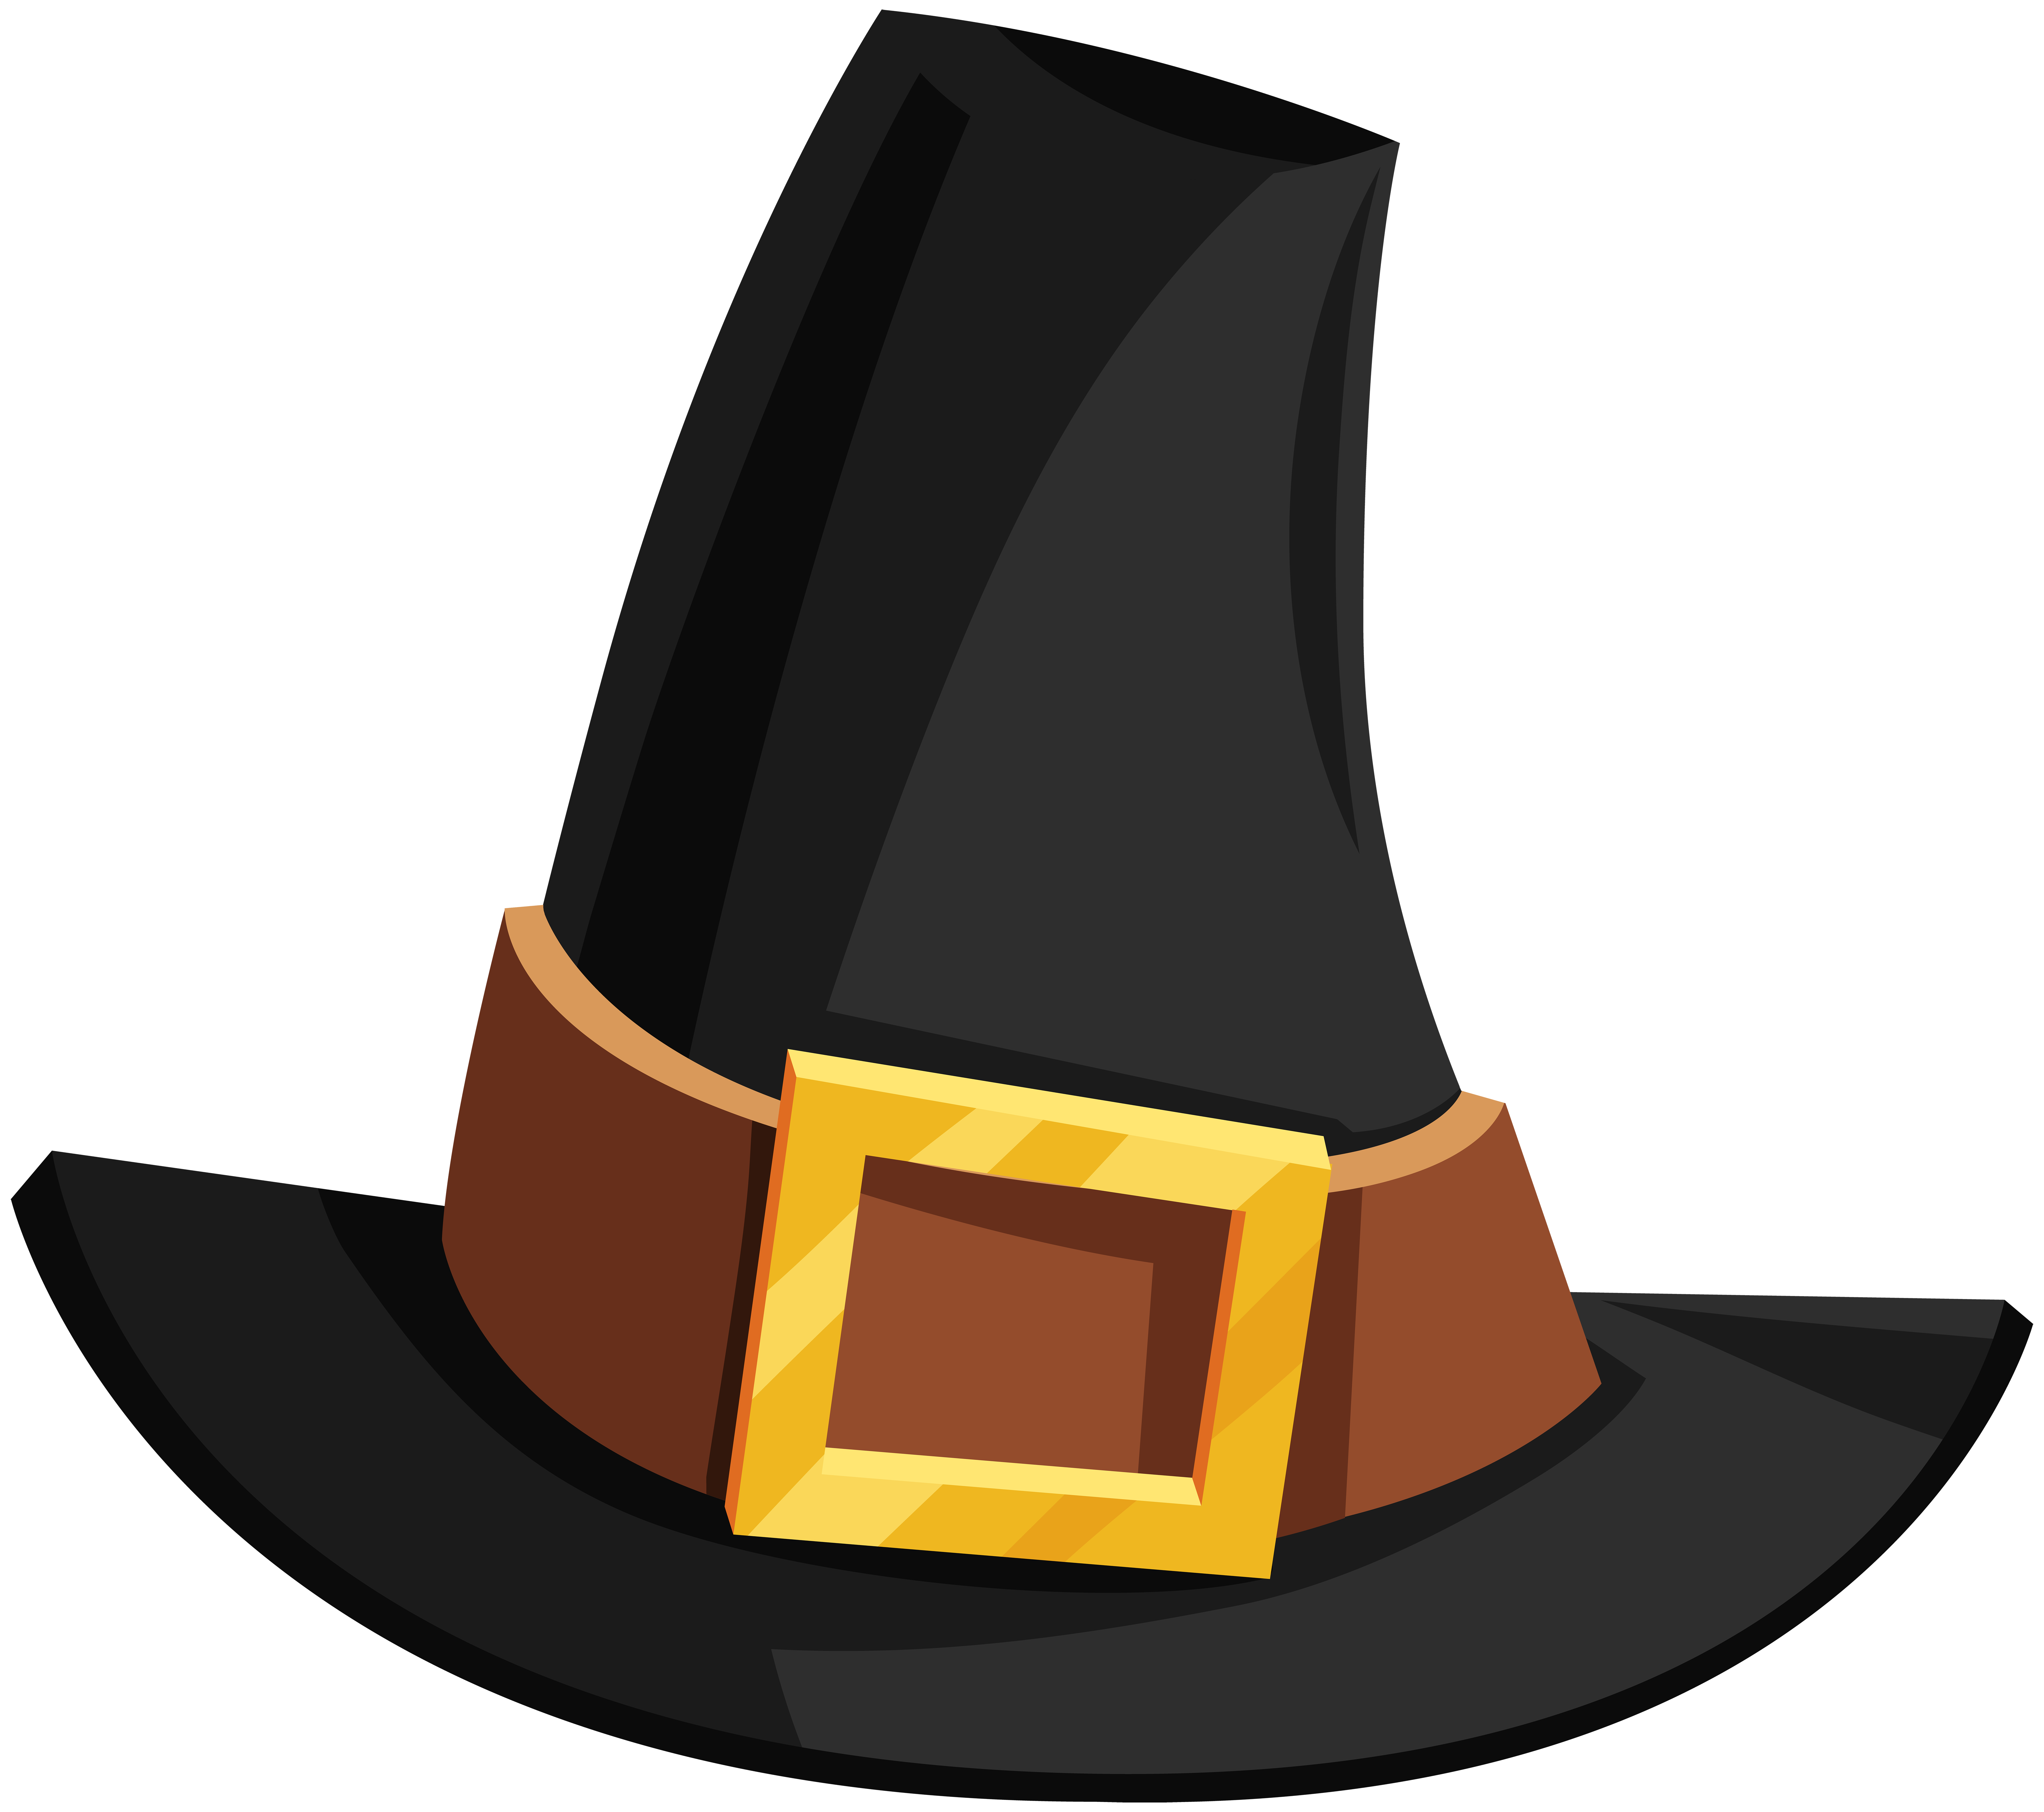 Detective clipart transparent background. Pilgrim hat png image